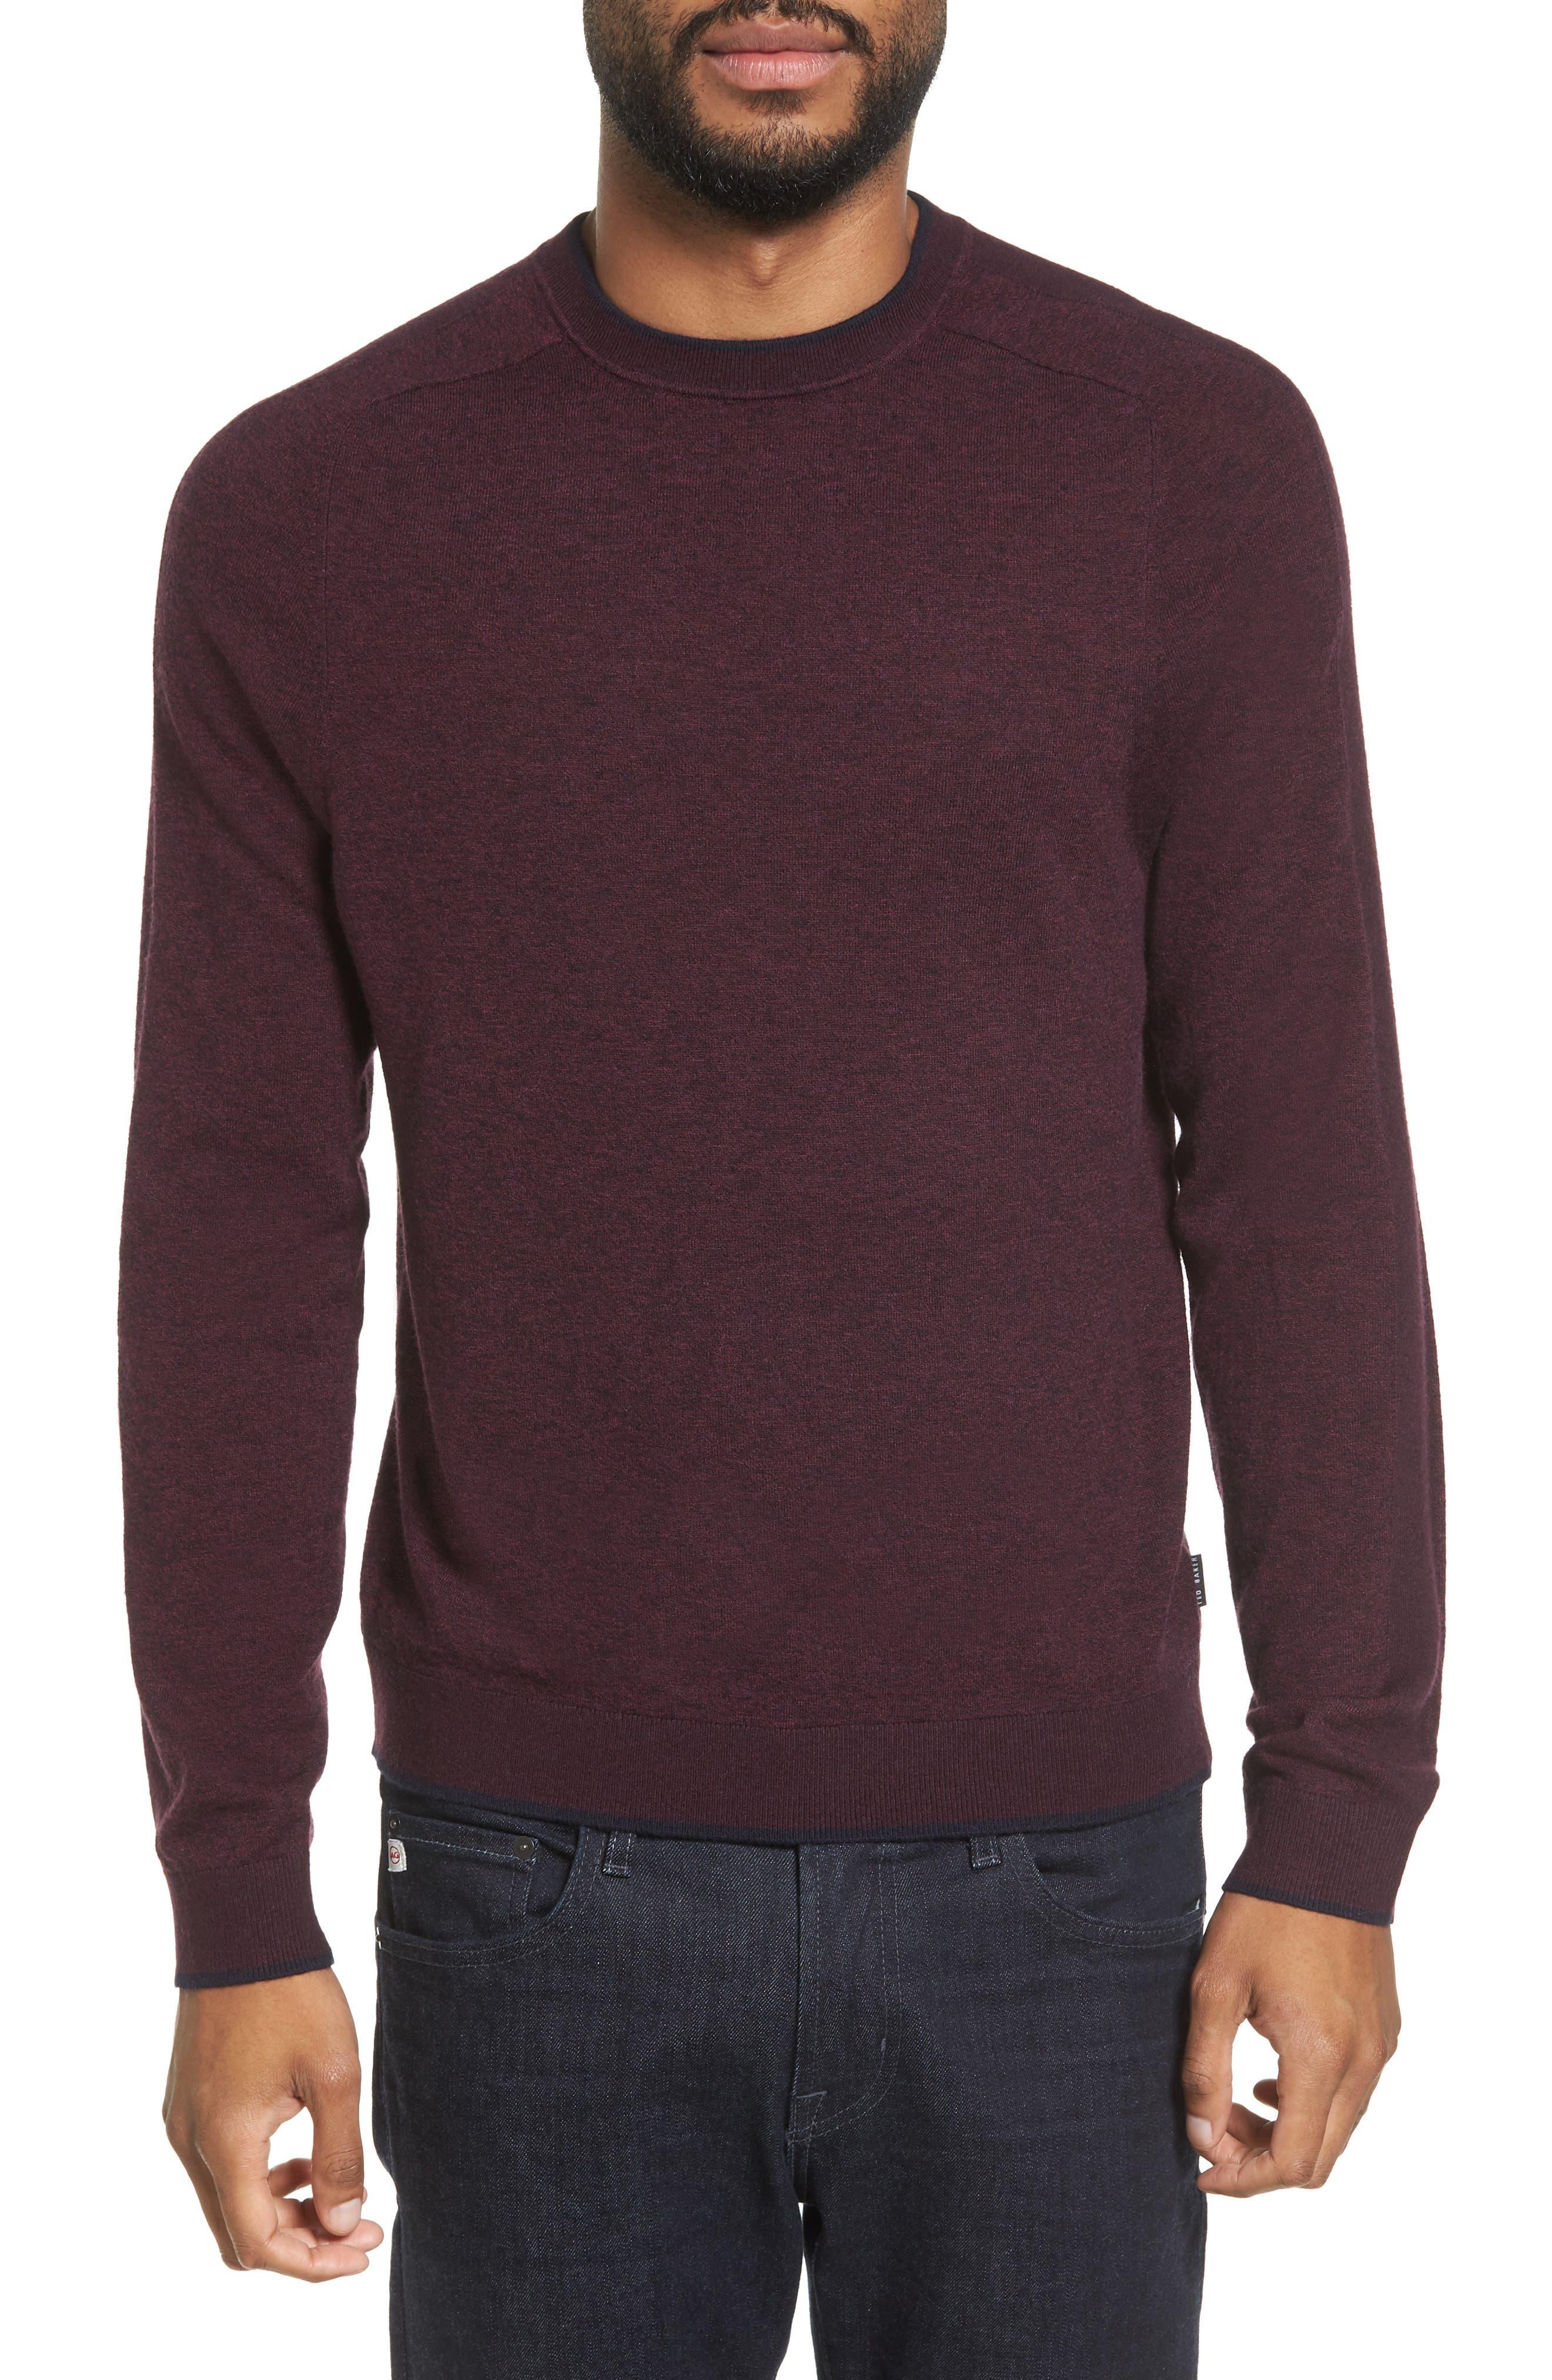 Main Image - Ted Baker London Norpol Crewneck Sweater